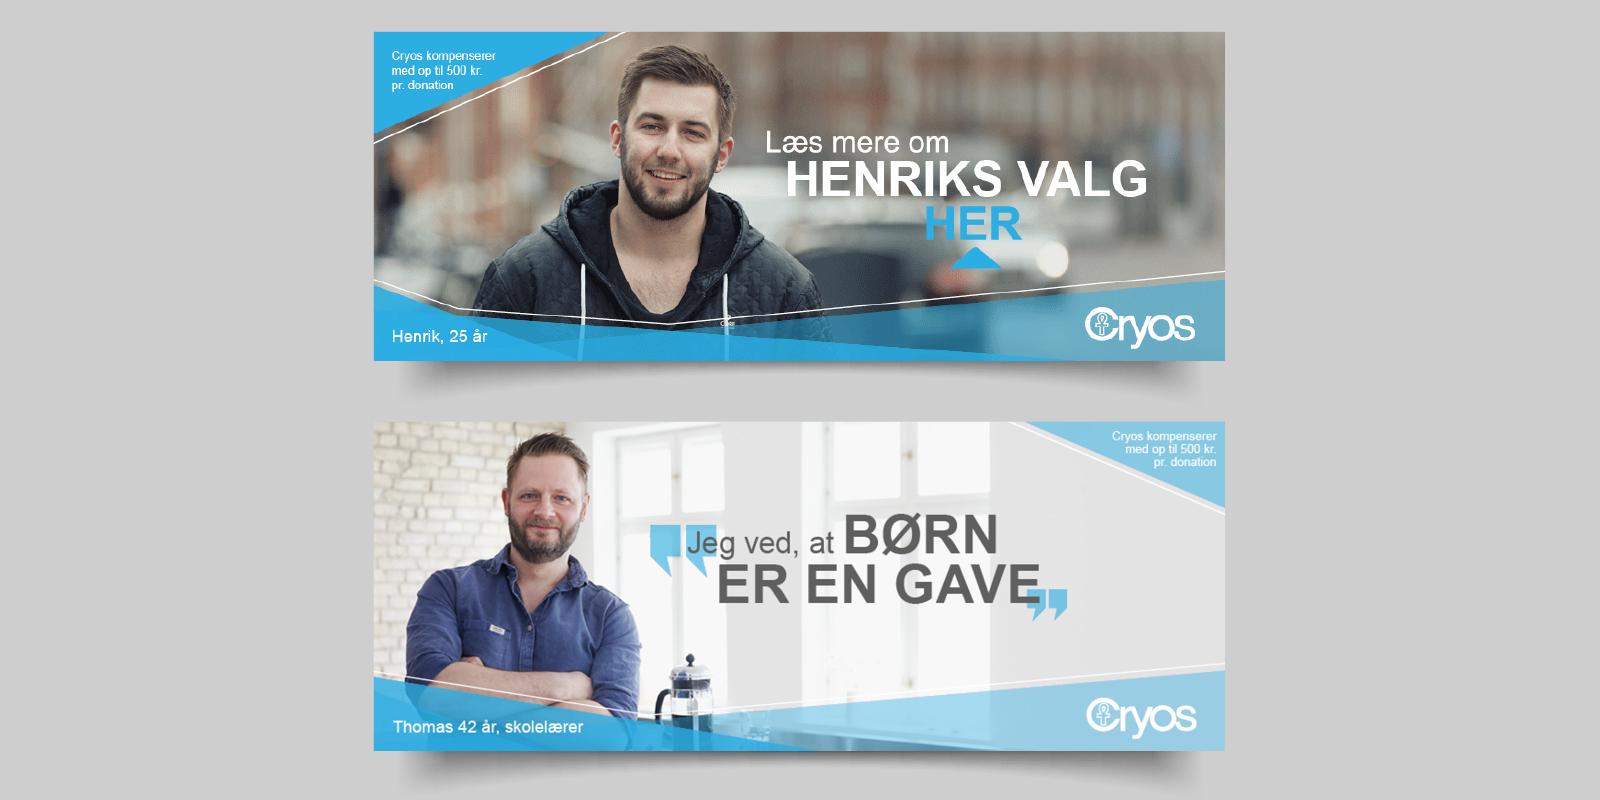 cryos international danmark, maria refsgaard, krims, grafisk design, freelance, selvstændig, aarhus